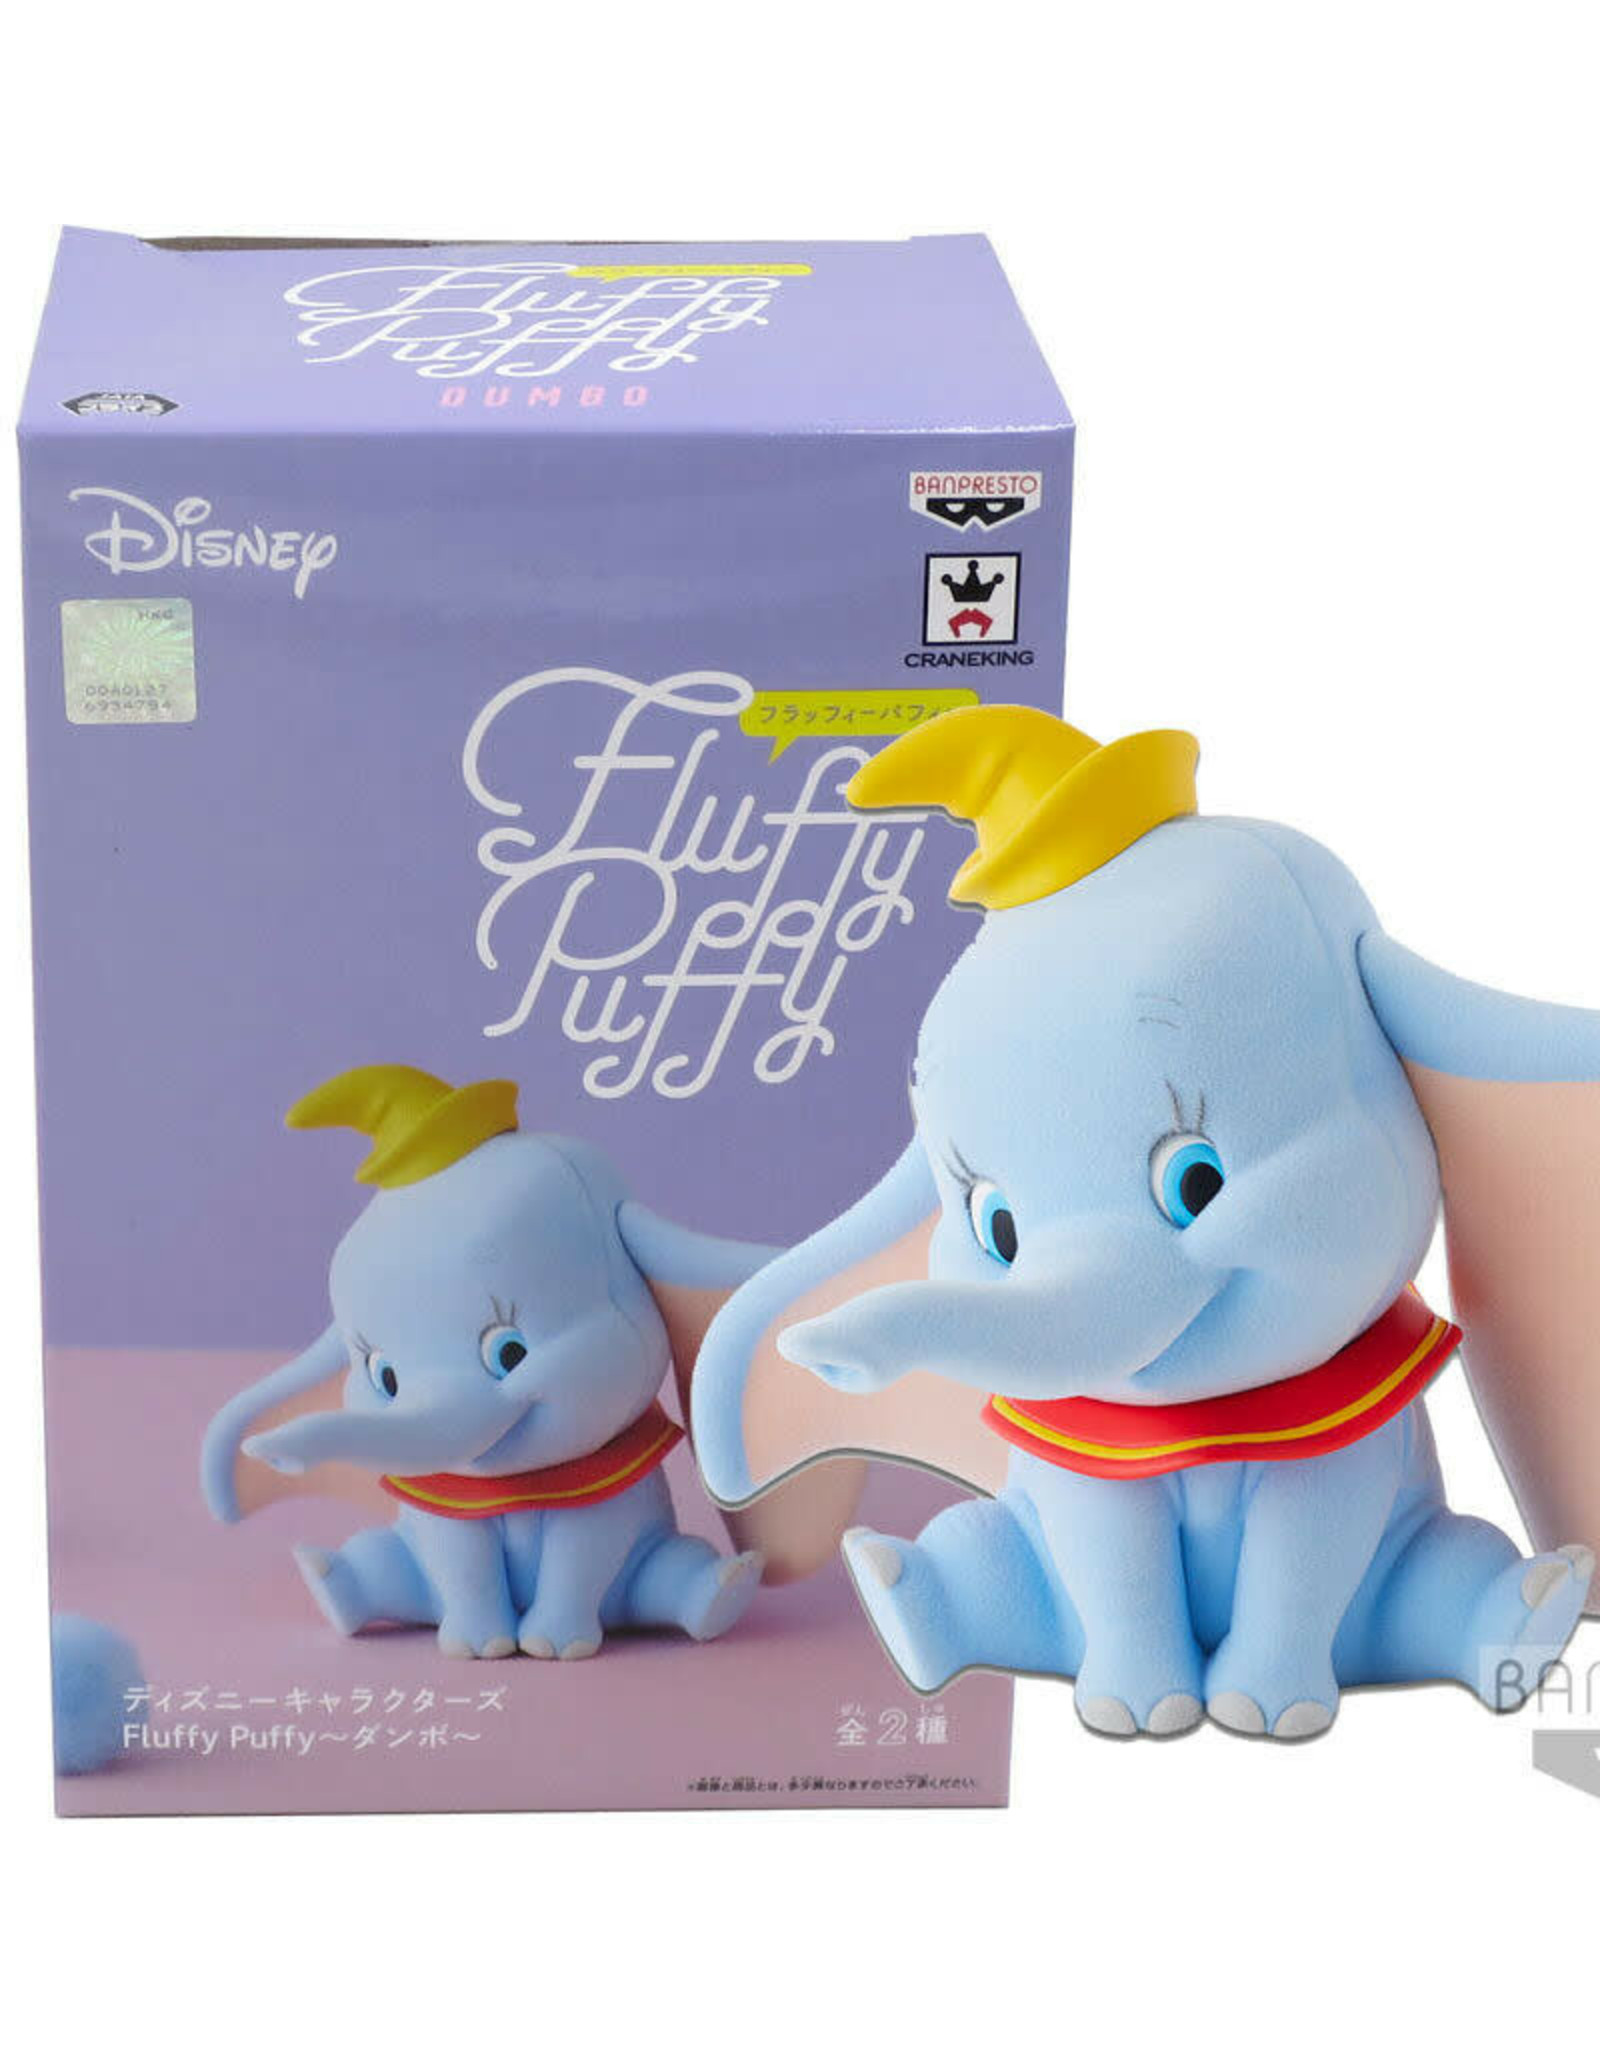 DISNEY - Fluffy Puffy - Dumbo Normal Version - 9cm